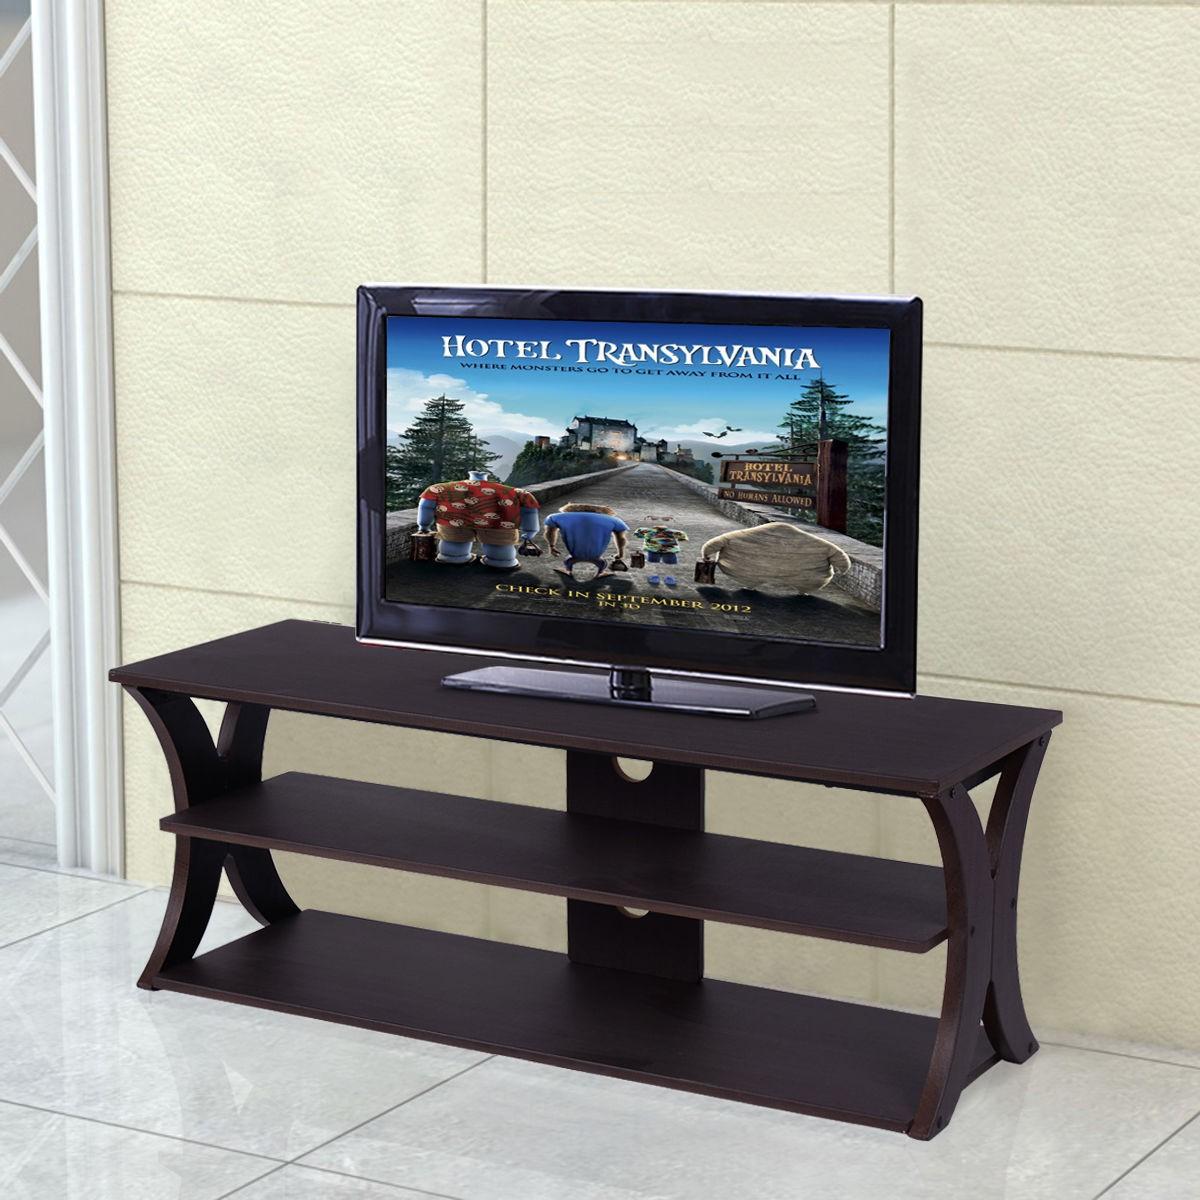 w 3 tier entertainment center tv stand home living room open shelf structure dvd. Black Bedroom Furniture Sets. Home Design Ideas